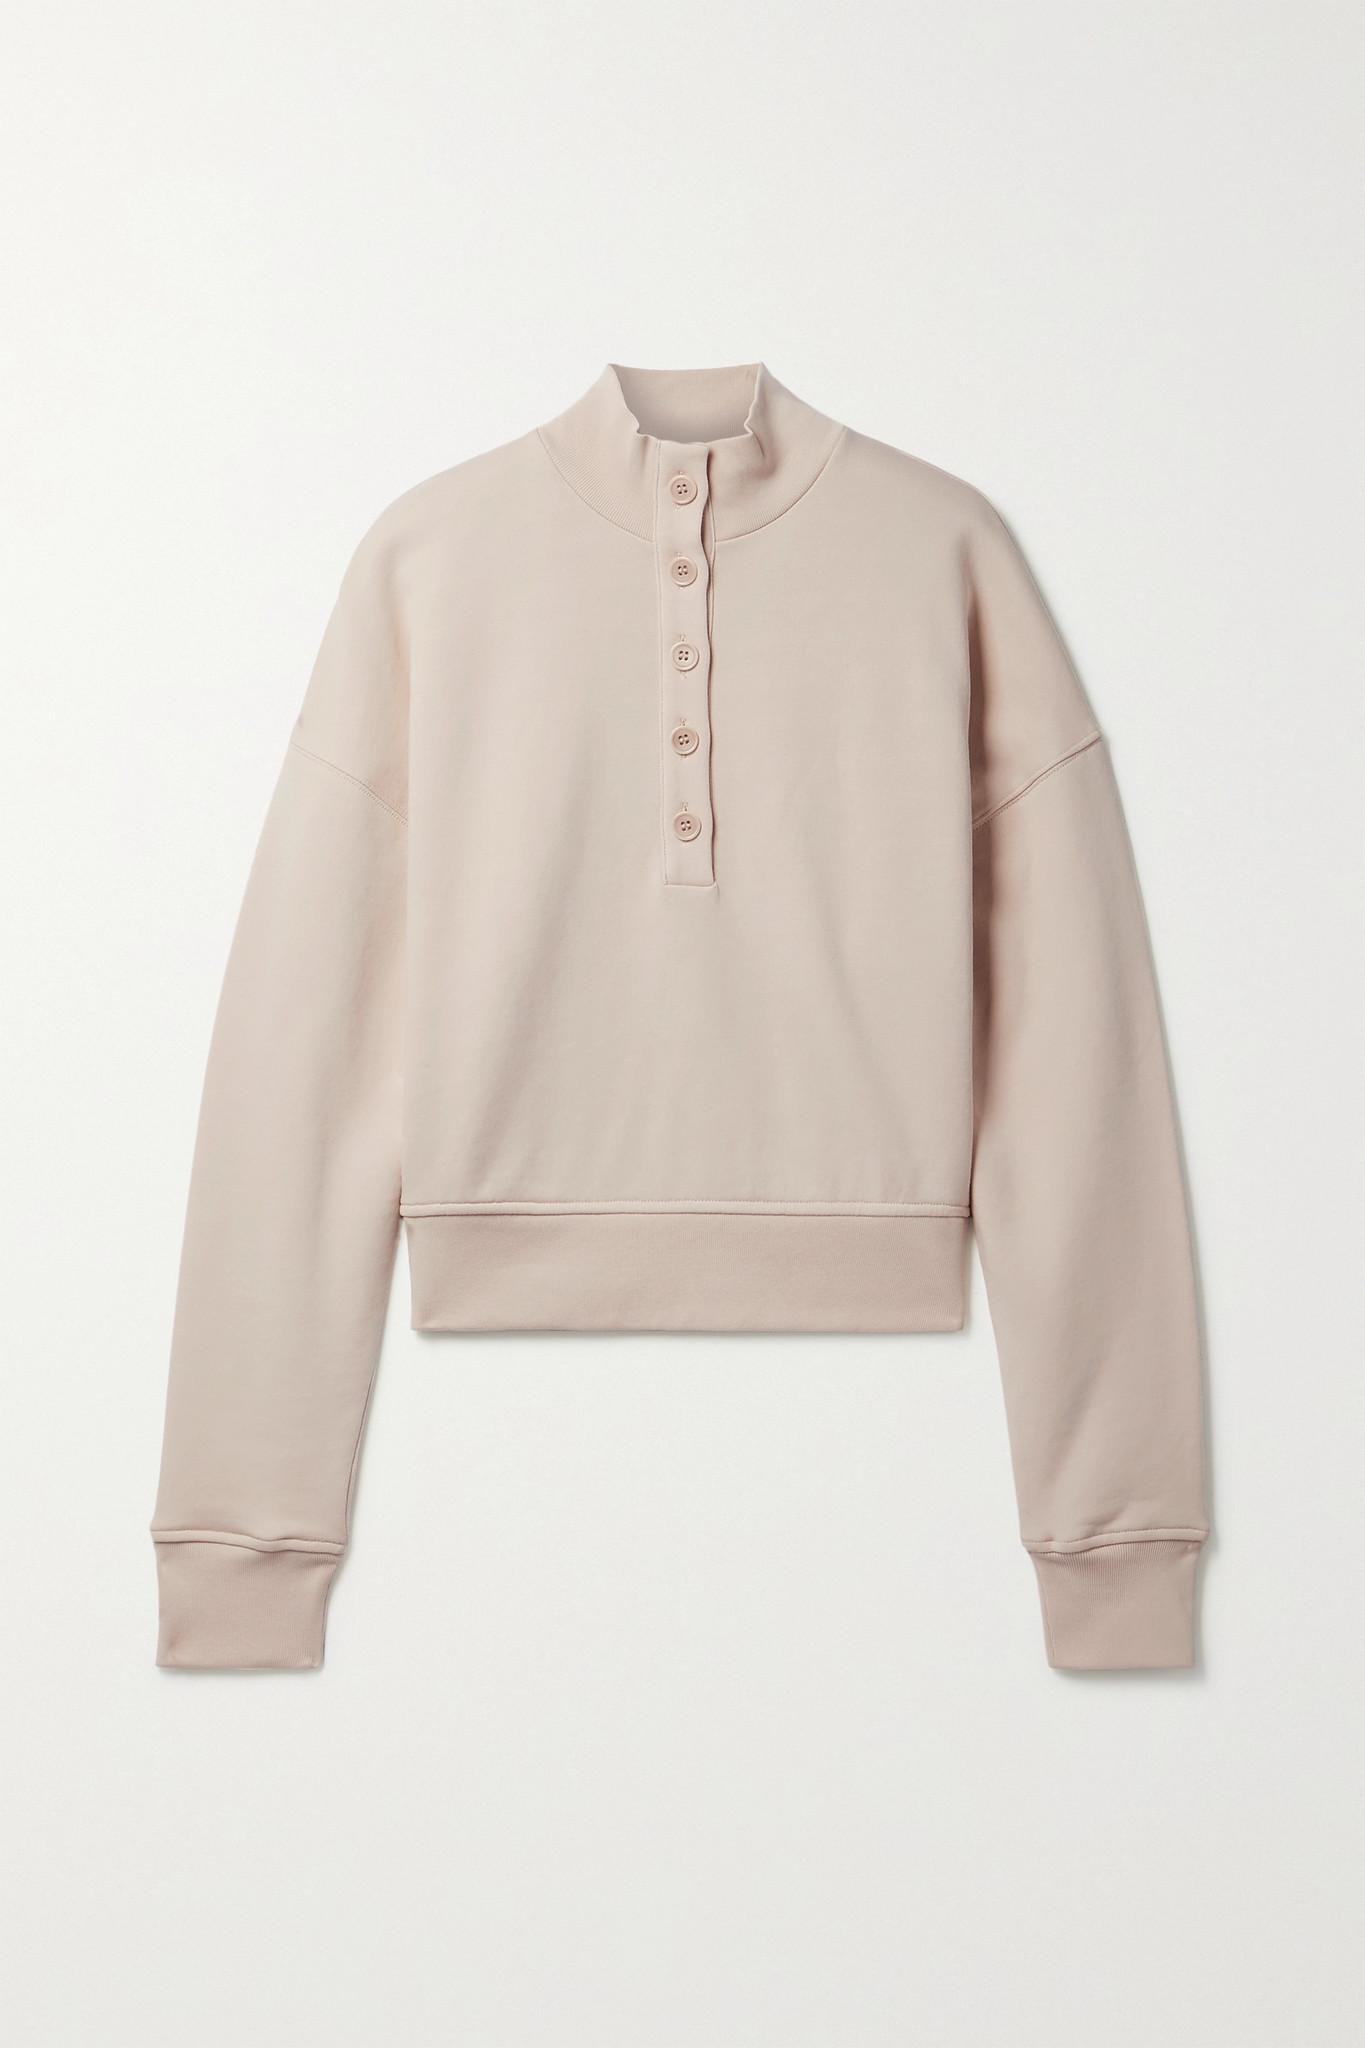 REFORMATION - 【net Sustain】marla 有机纯棉平纹布卫衣 - 中性色 - large